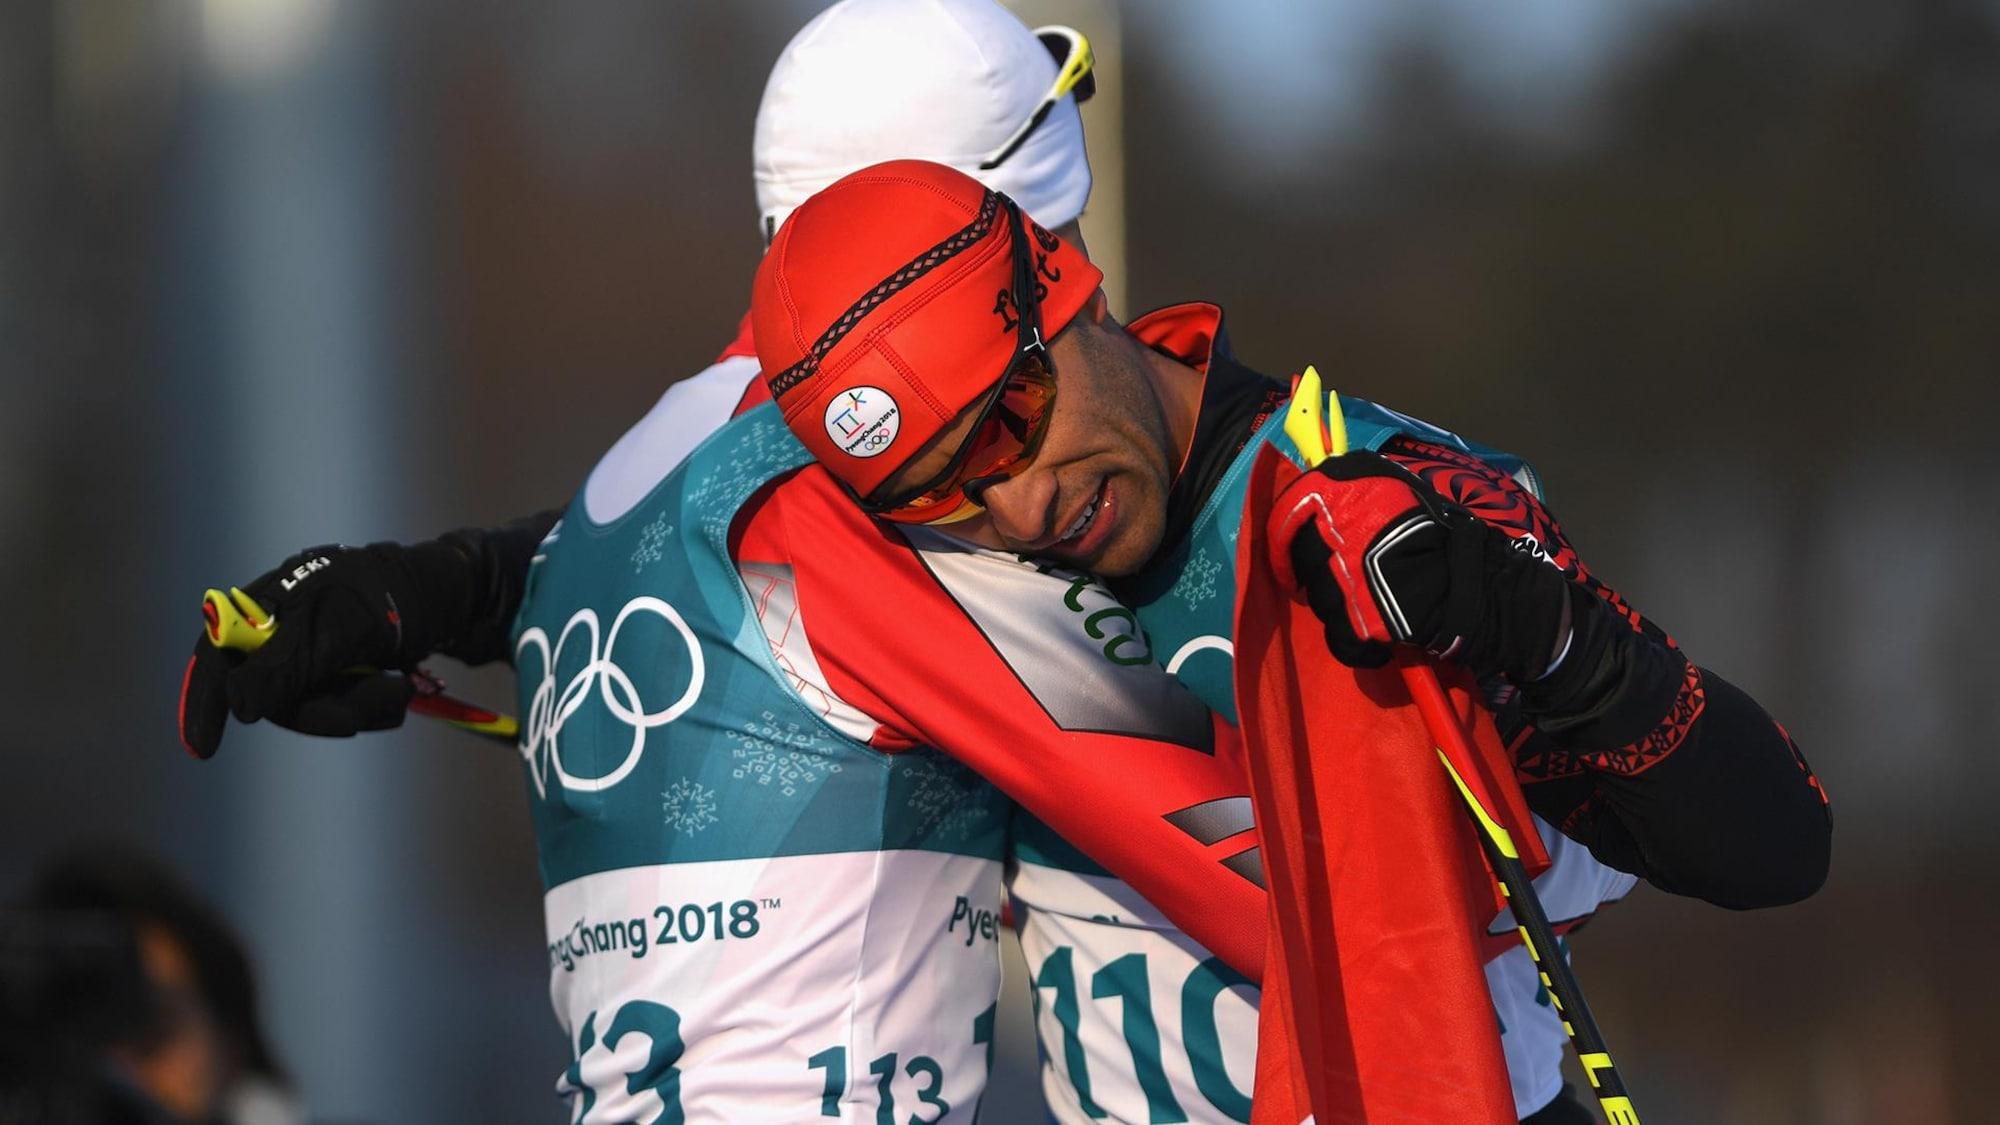 Deux skieurs se font l'accolade.